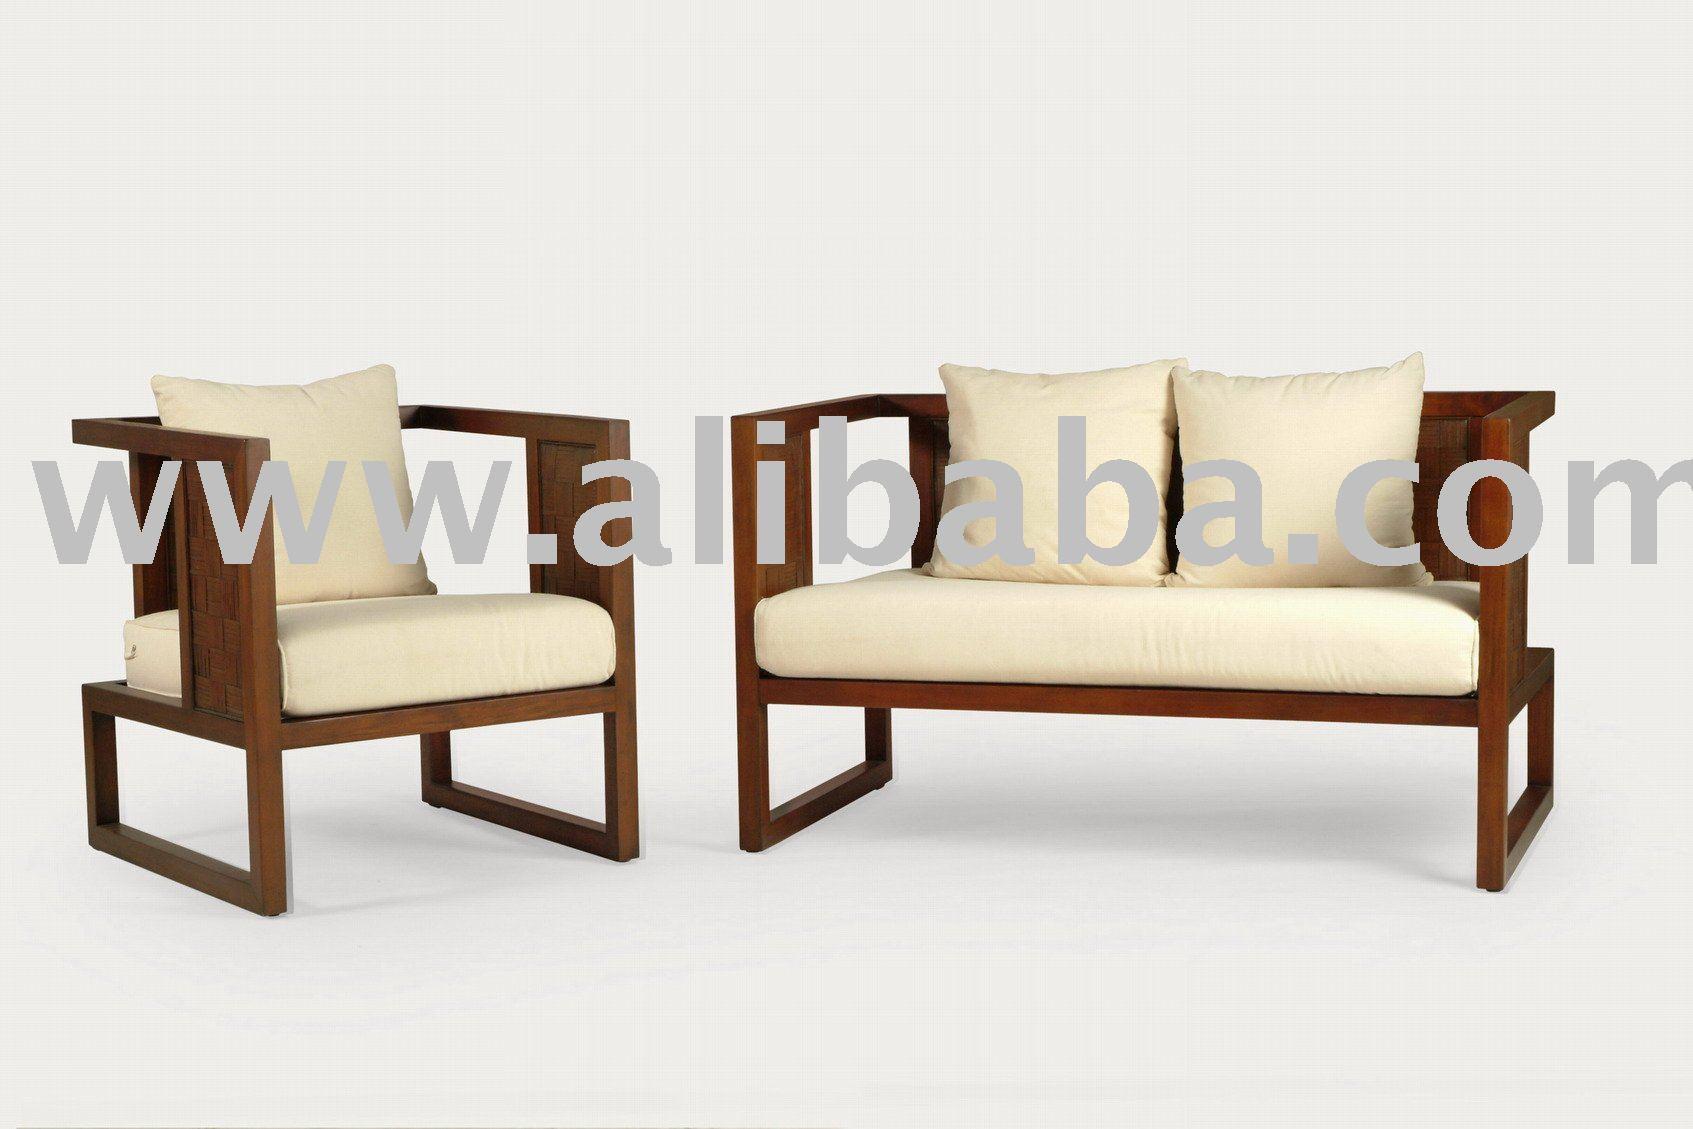 Super Cheap Dining Set In Cebu Dining Set Aparador Office Table Creativecarmelina Interior Chair Design Creativecarmelinacom